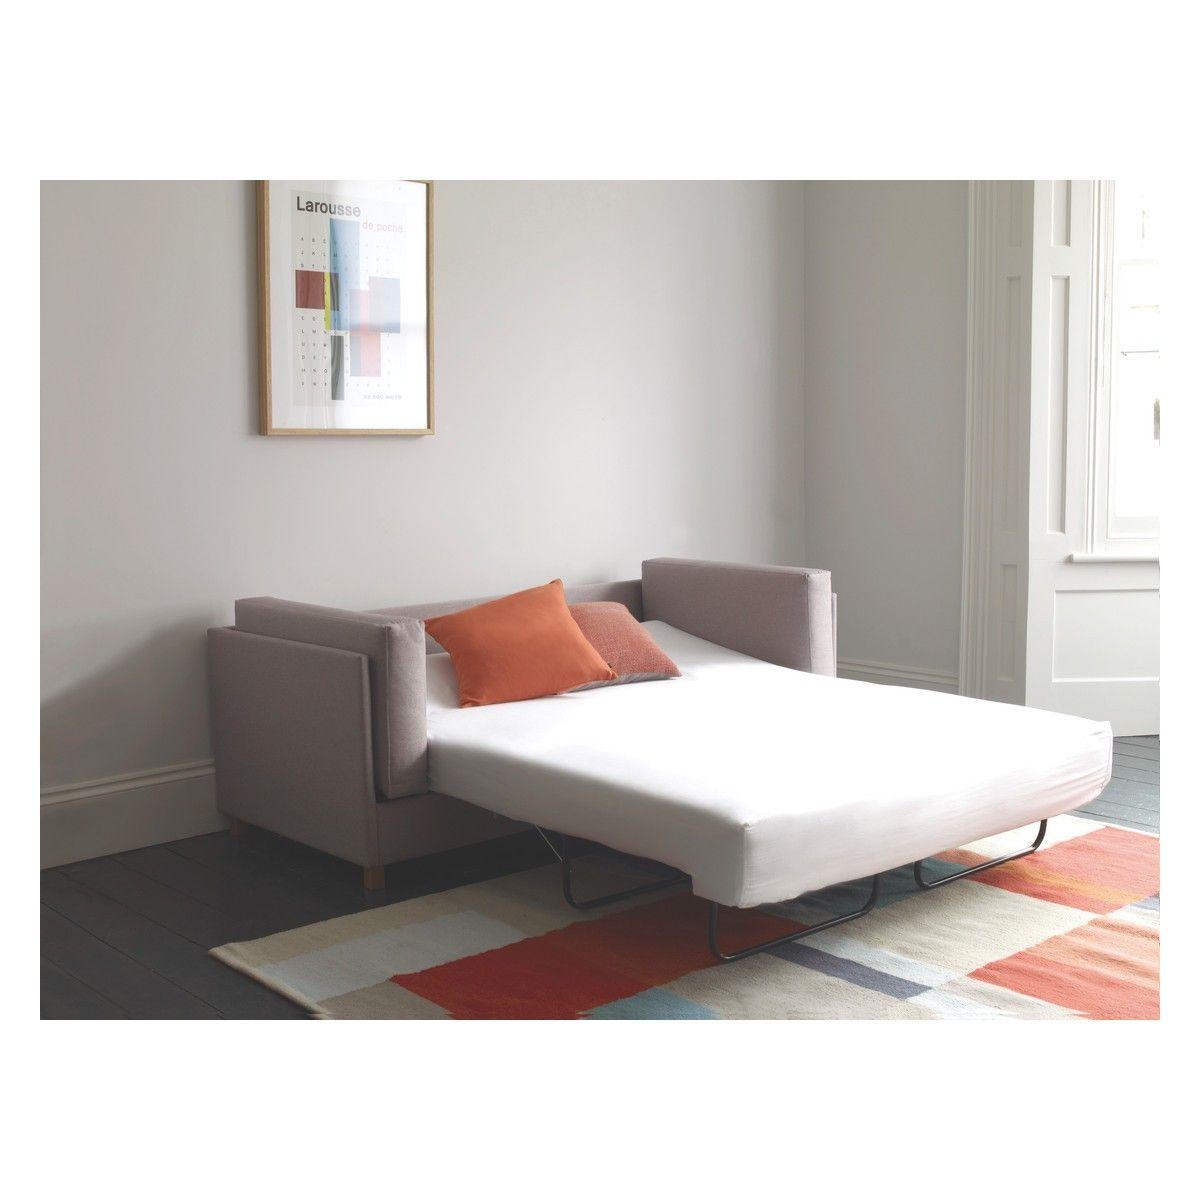 COLOMBO Grey fabric 3 seater sofa bed Grey fabric Fabrics and